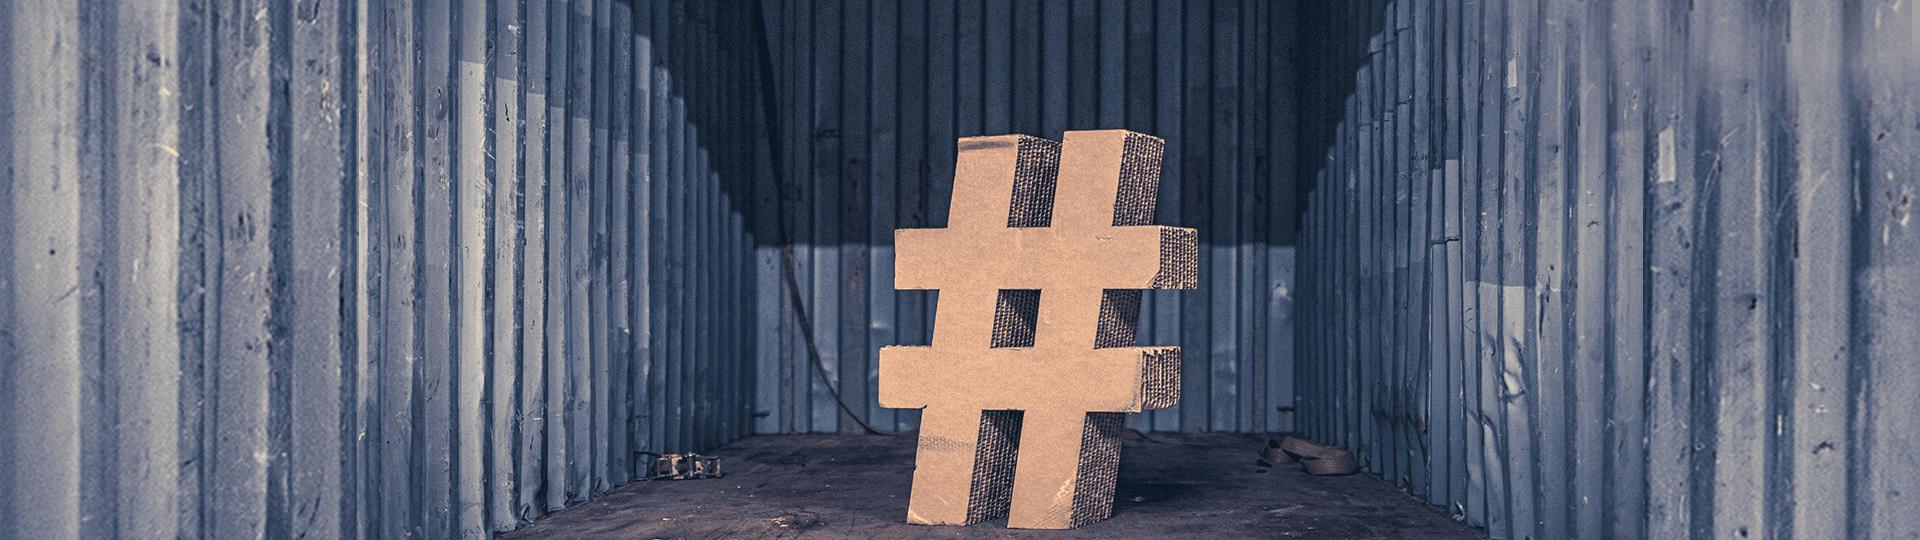 IG Hashtags